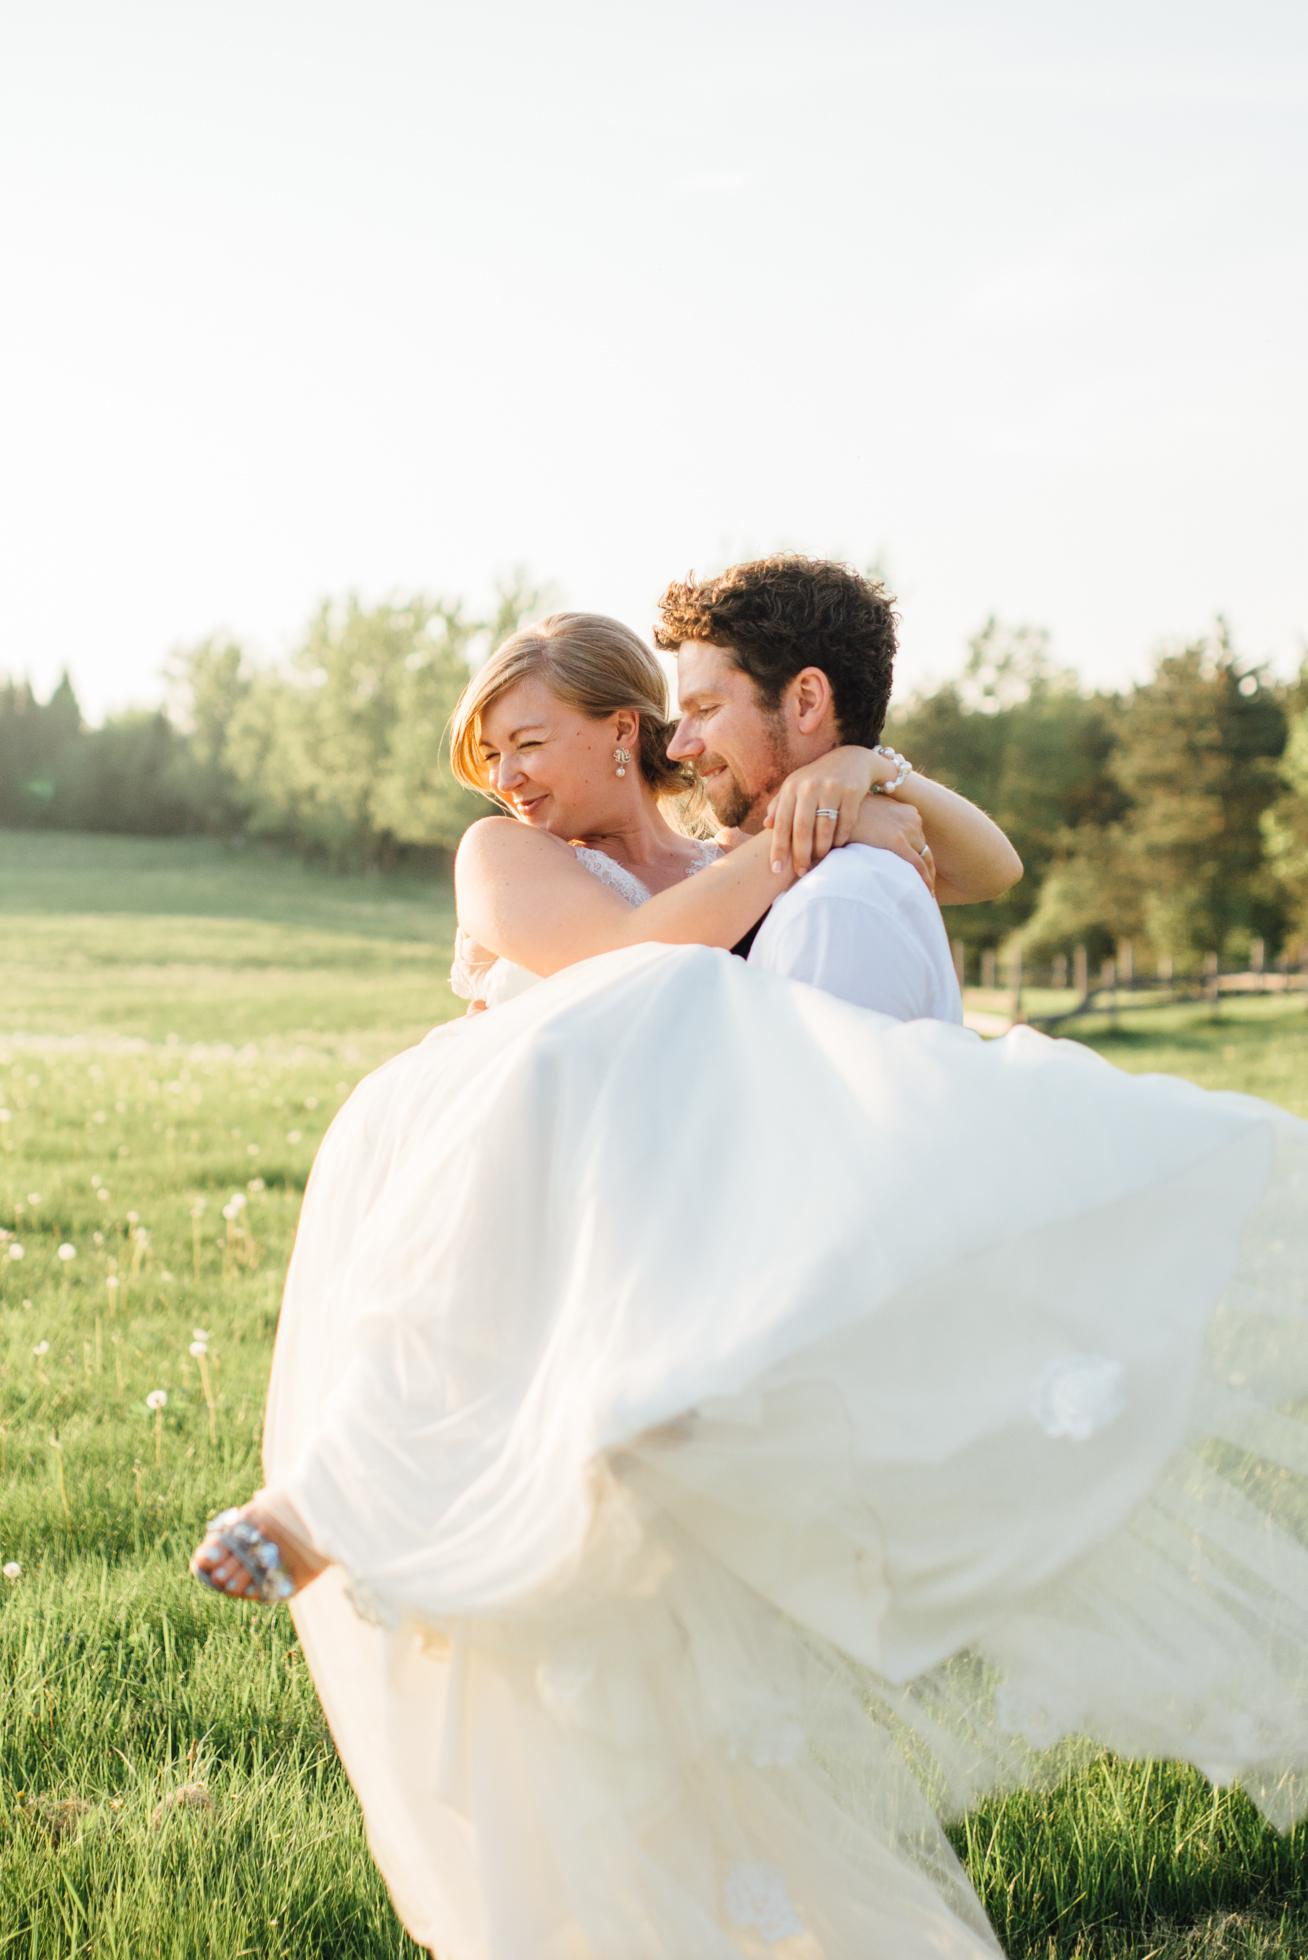 Outdoor Wedding at Tralee in Caledon - Sara Monika, Photographer